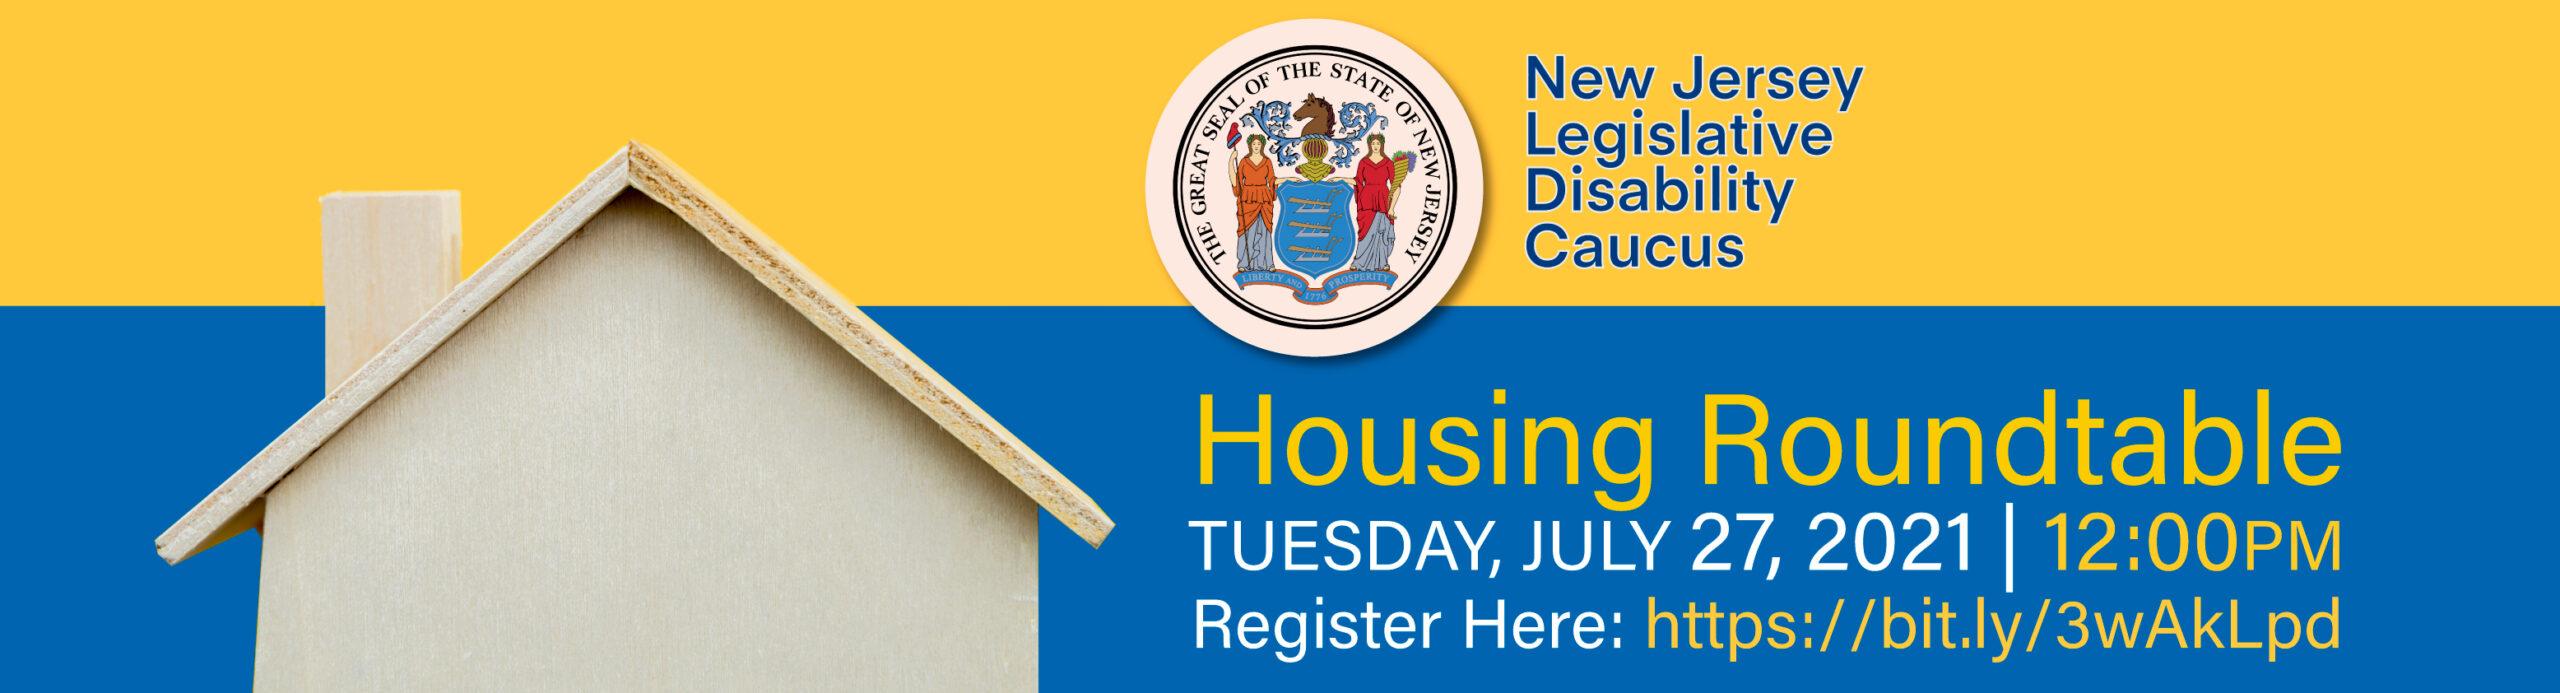 NJDisabilityCaucus-Housing-Julyl272021